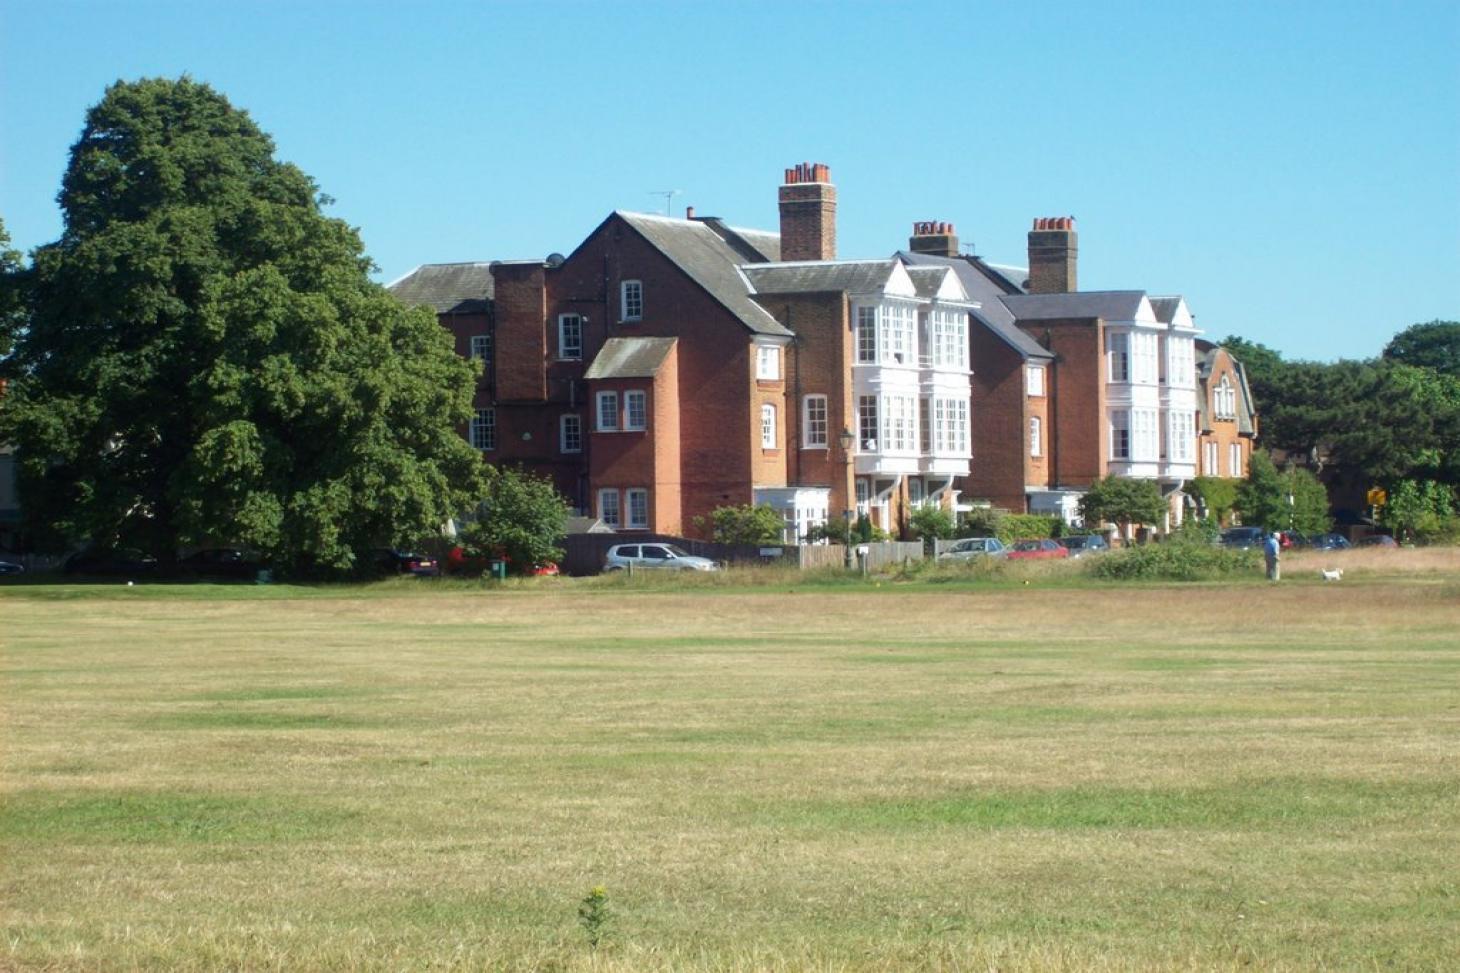 London Scottish Golf Club 18 hole golf course